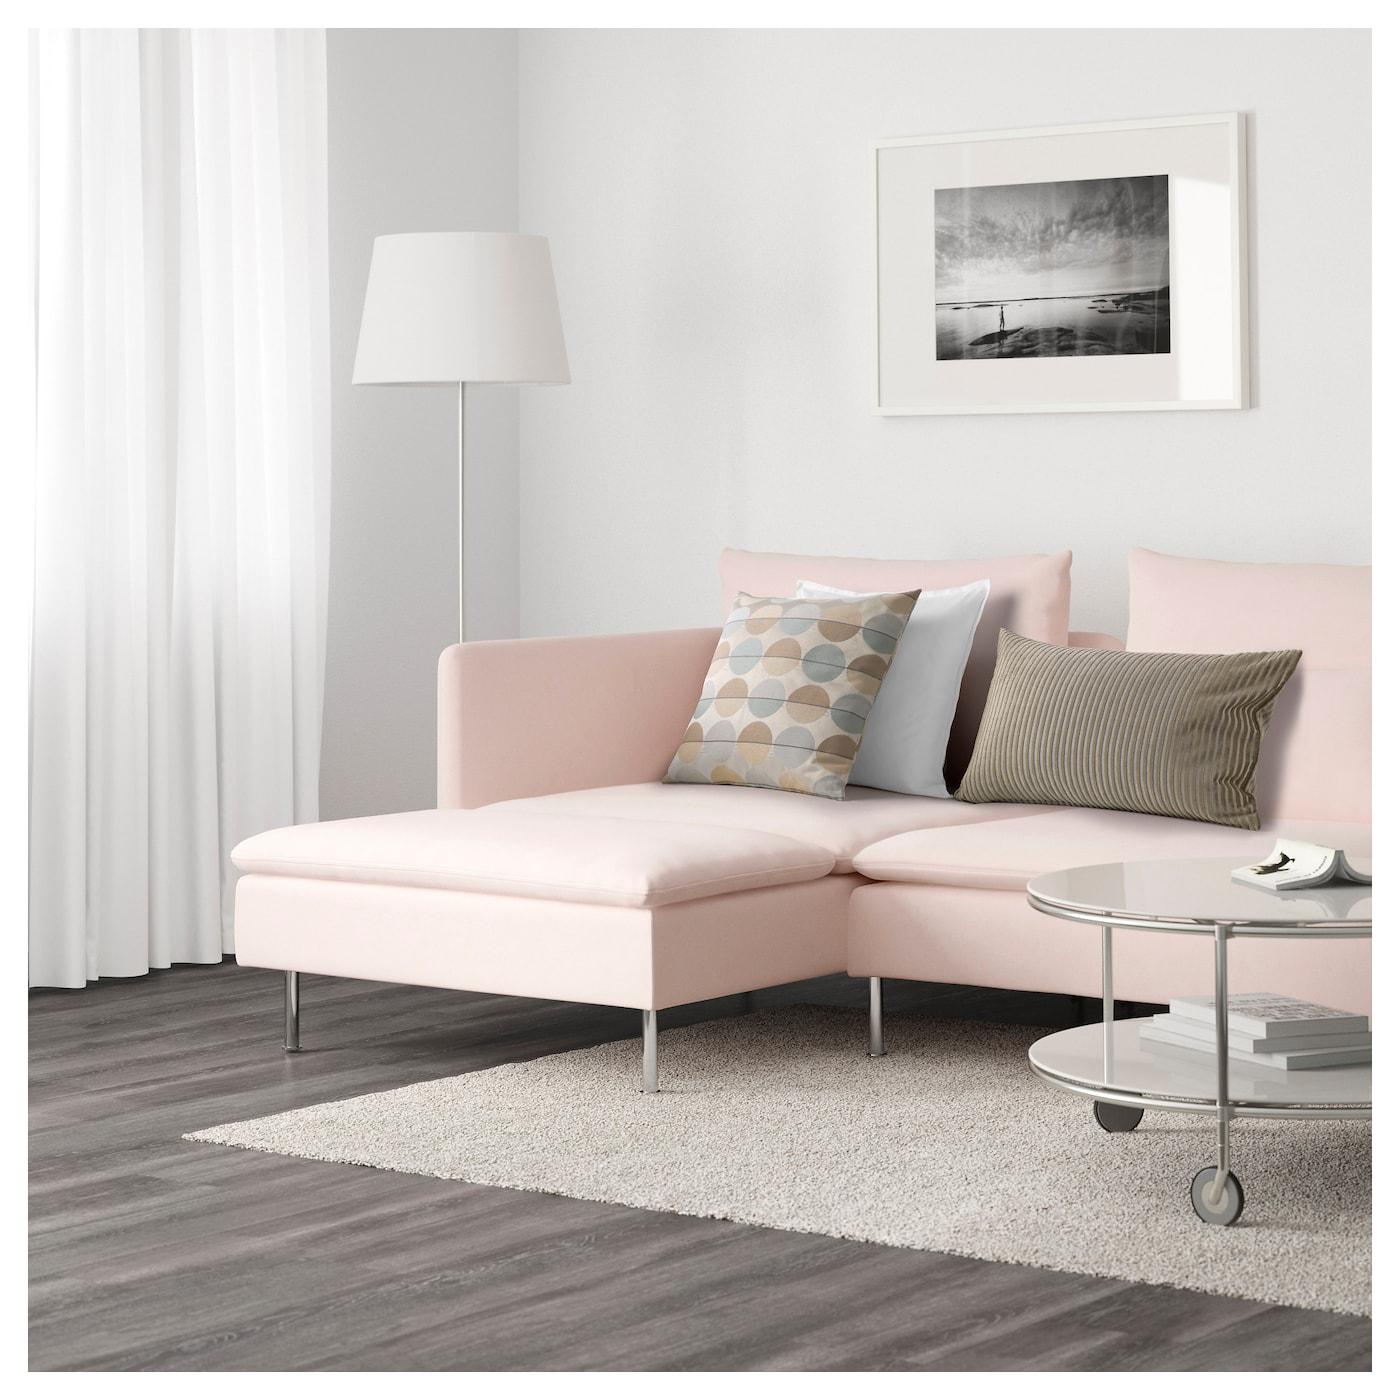 S Derhamn Canap D Angle 4 Places Samsta Rose Clair 291×198 Cm Ikea # Meuble D'Angle Ikea Rose